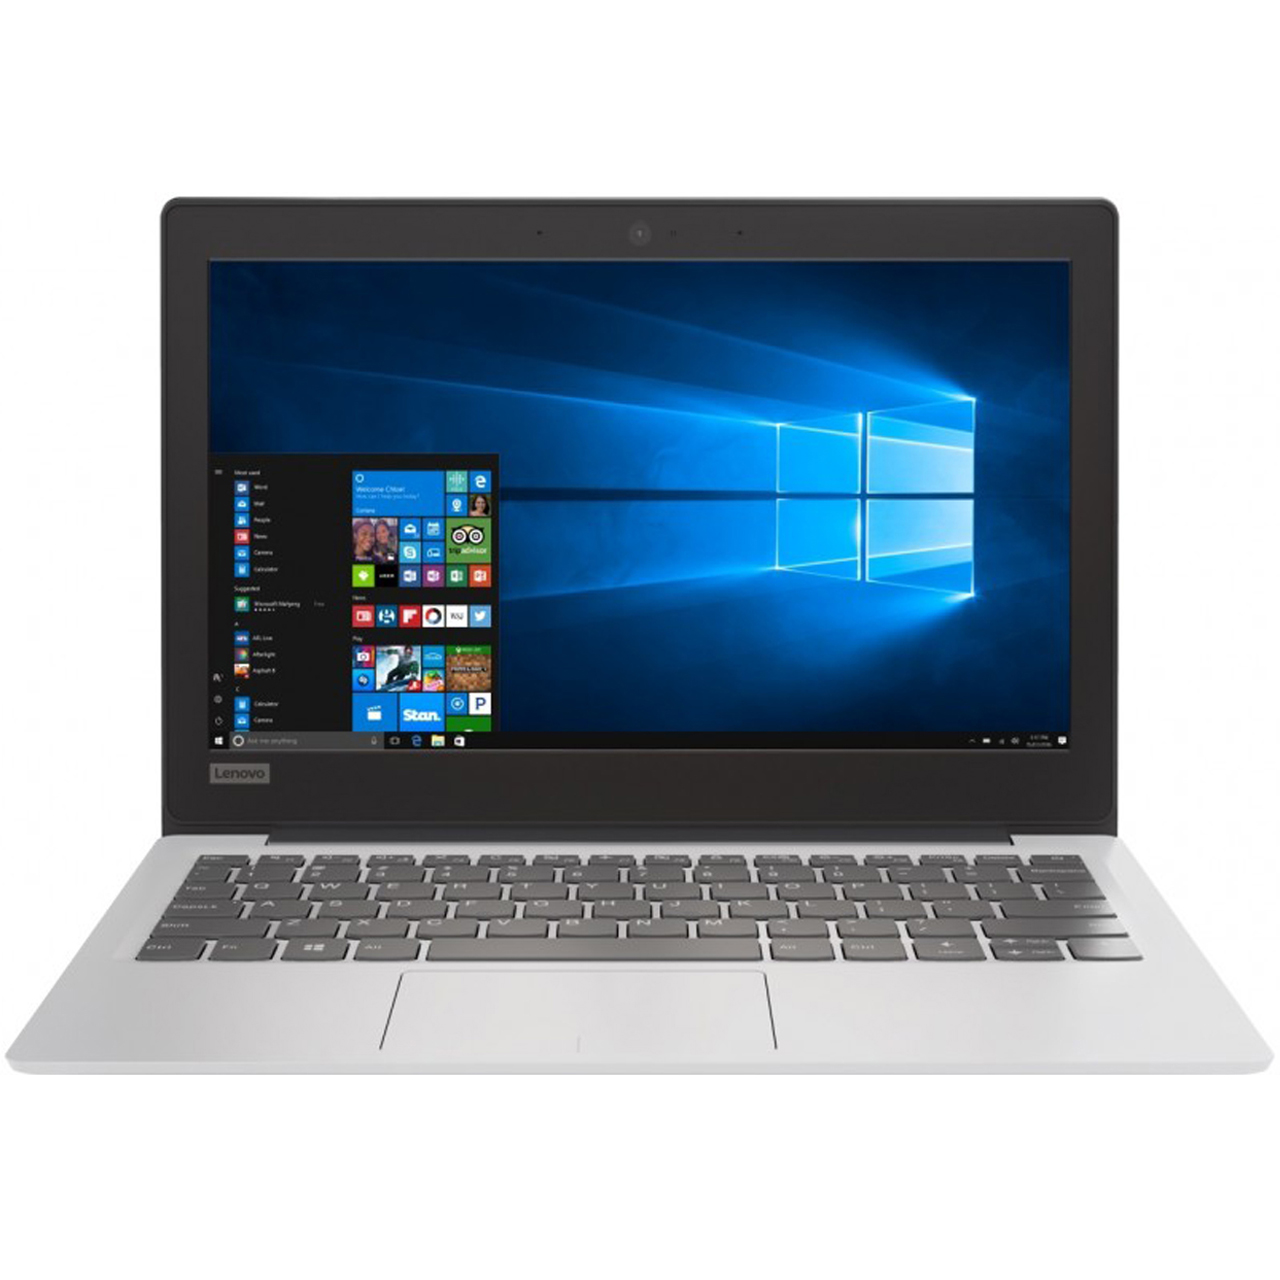 لپ تاپ 15 اینچی لنوو مدل Ideapad 320 - PA